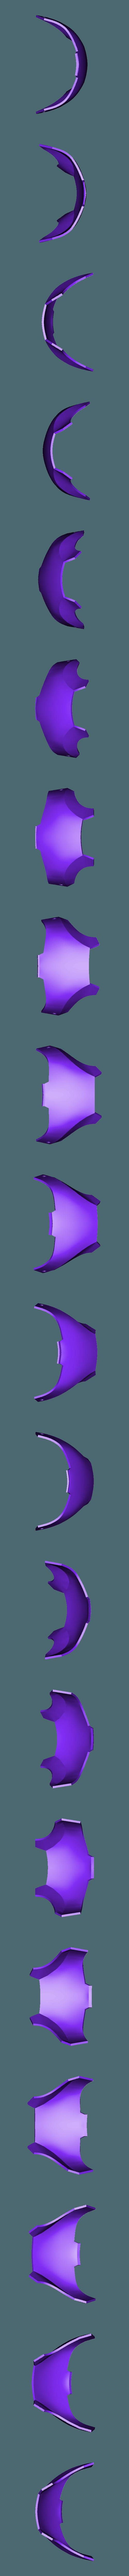 KF_helmet2-1.stl Download free STL file Iron Man Mark III Helmet Separated and Oriented • 3D printer template, KerseyFabrications